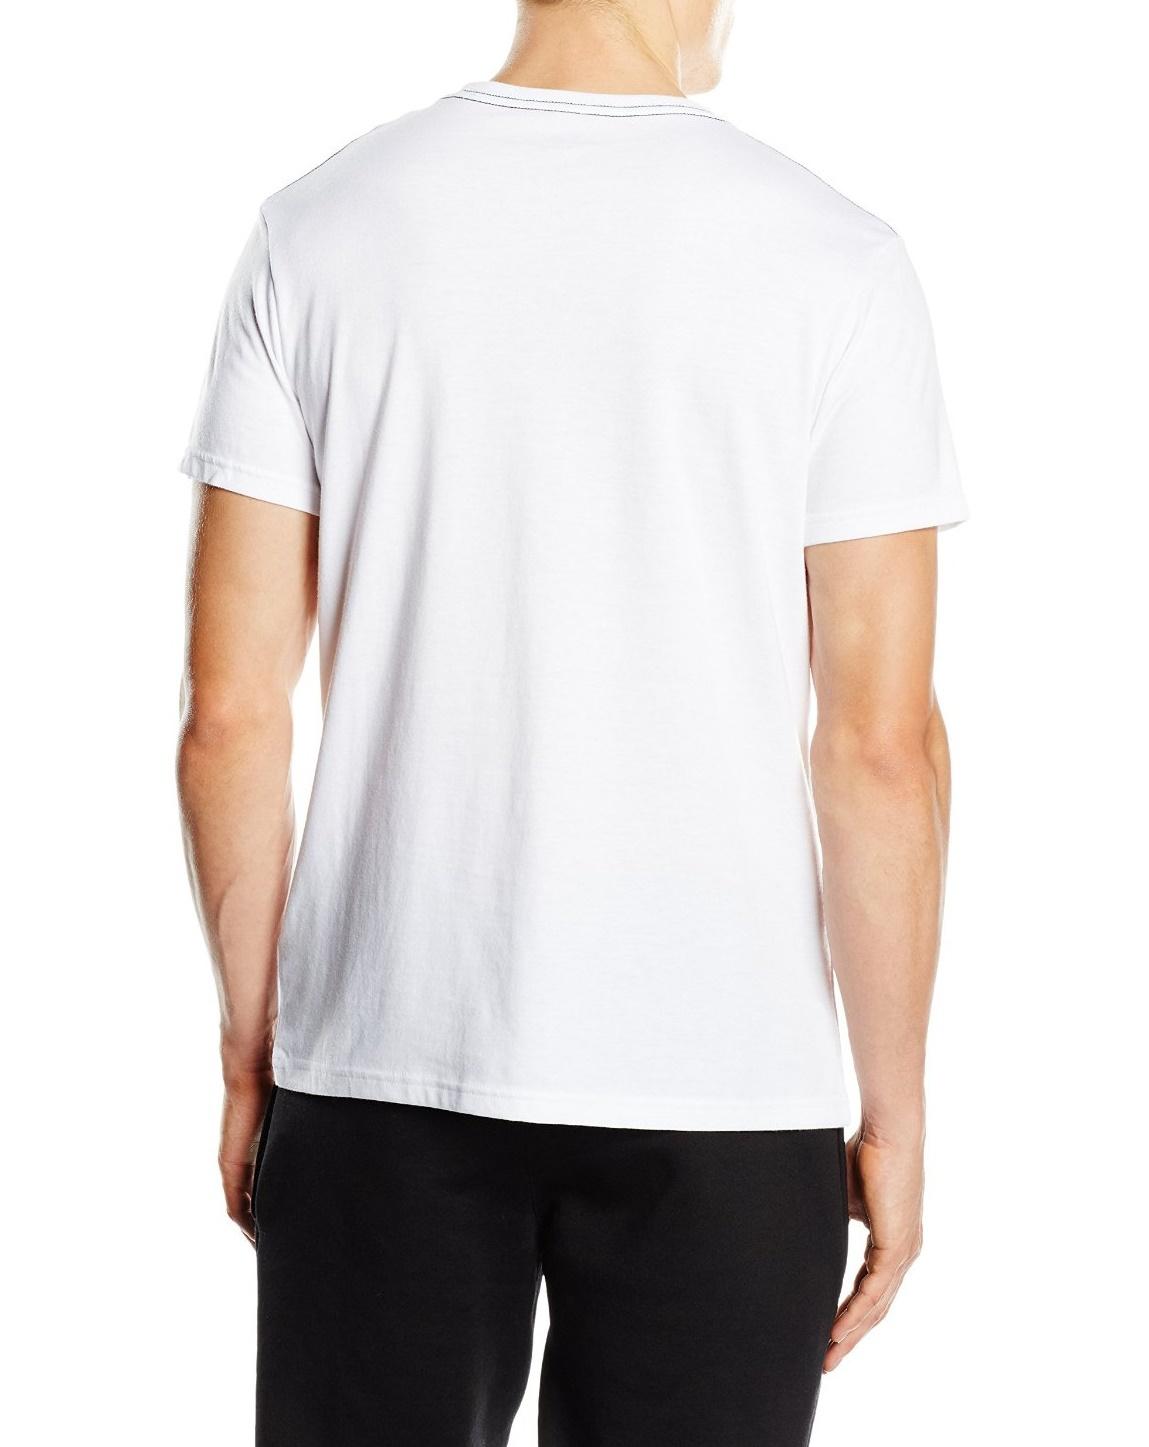 Мужская футболка асикс Graphic SS Top (125074 0001)